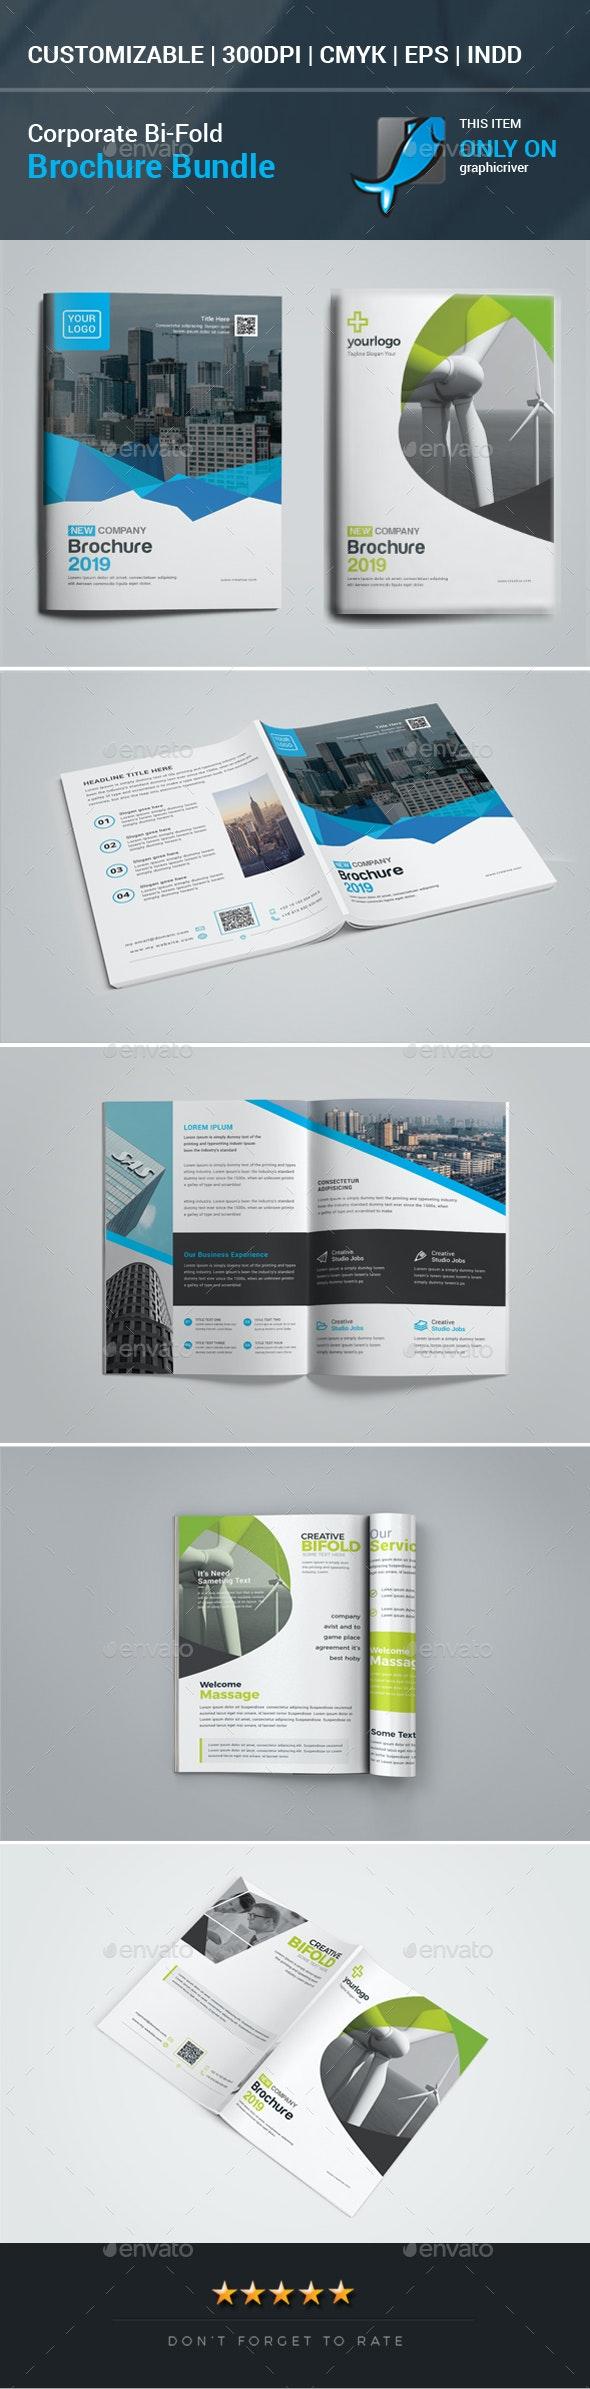 Bi-Fold Brochure Bundle - Corporate Brochures